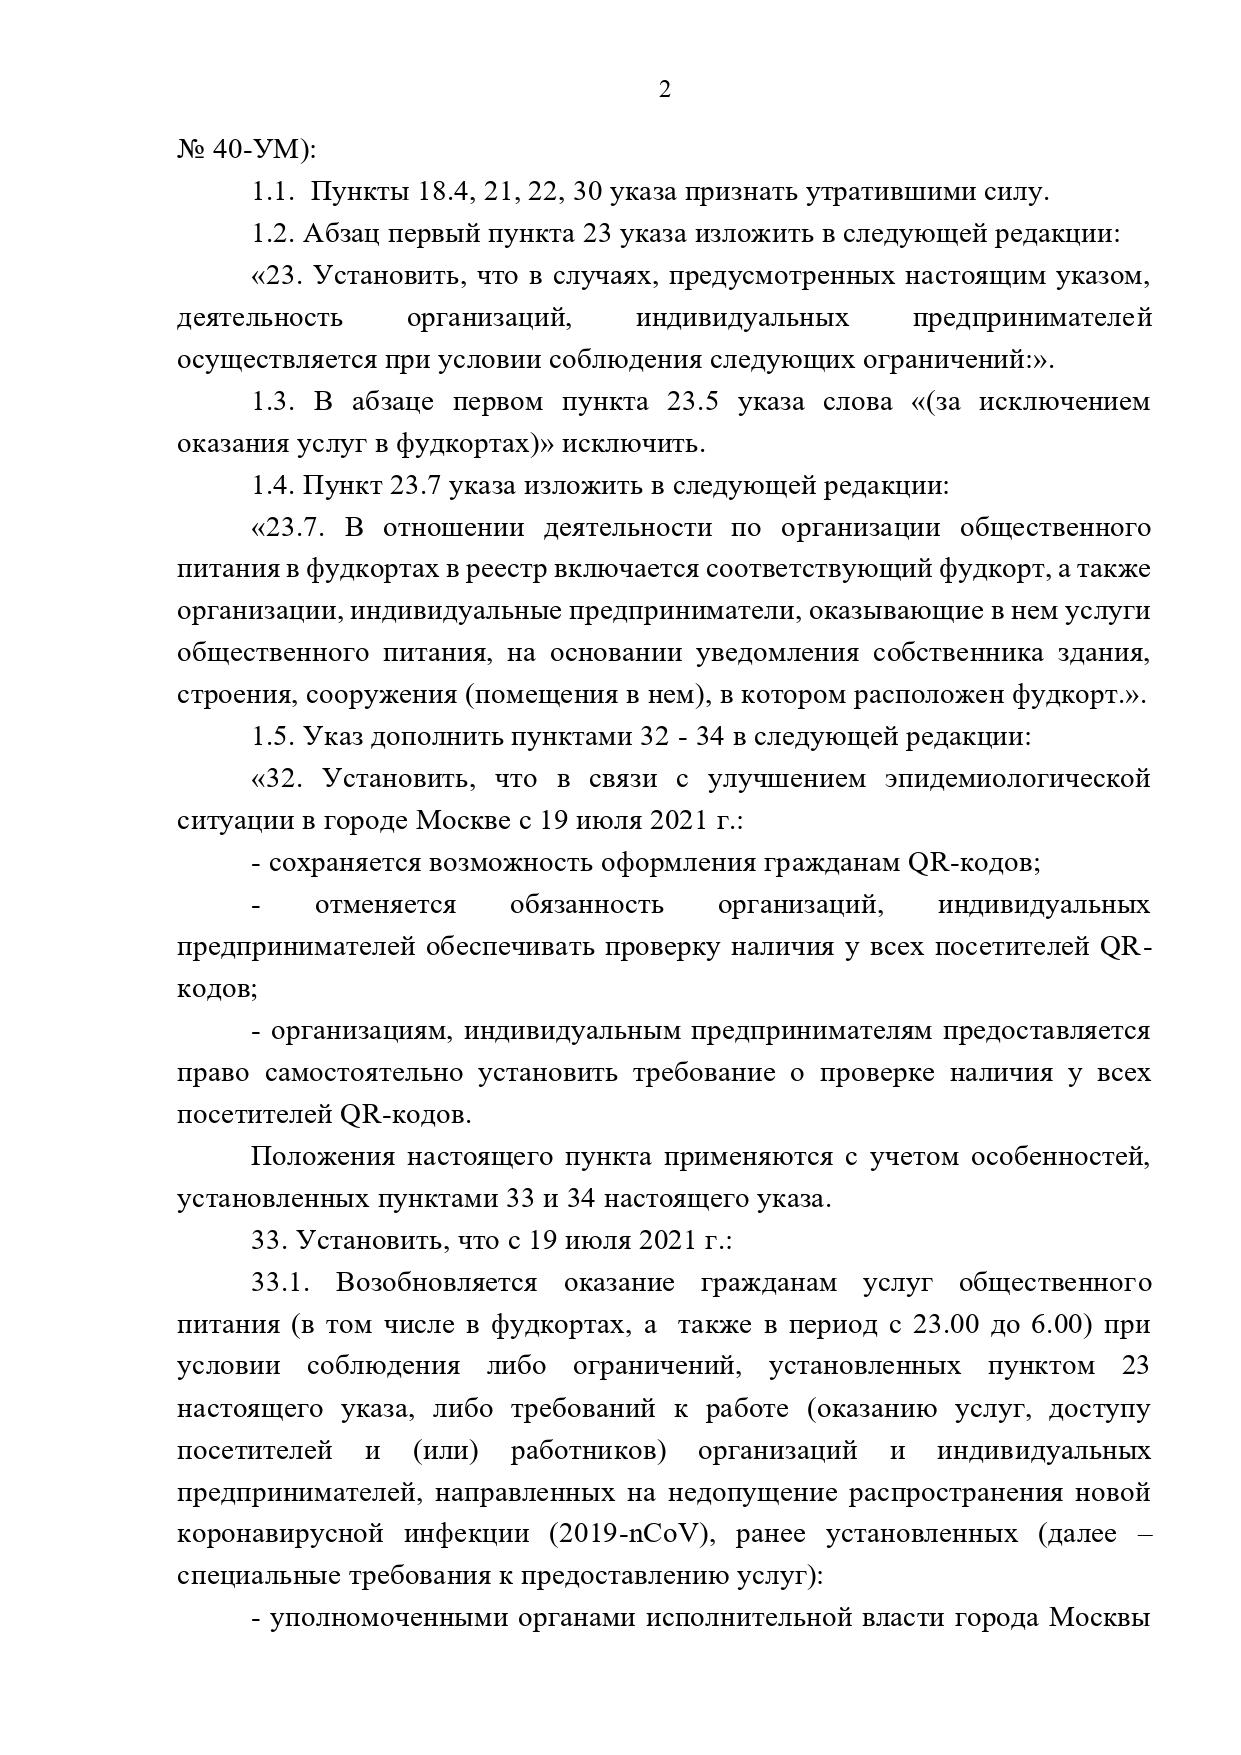 Указ Мэра Москвы Собянина С.С. от 16 июля 2021 г. (16.07.2021) No 42-УМ 2